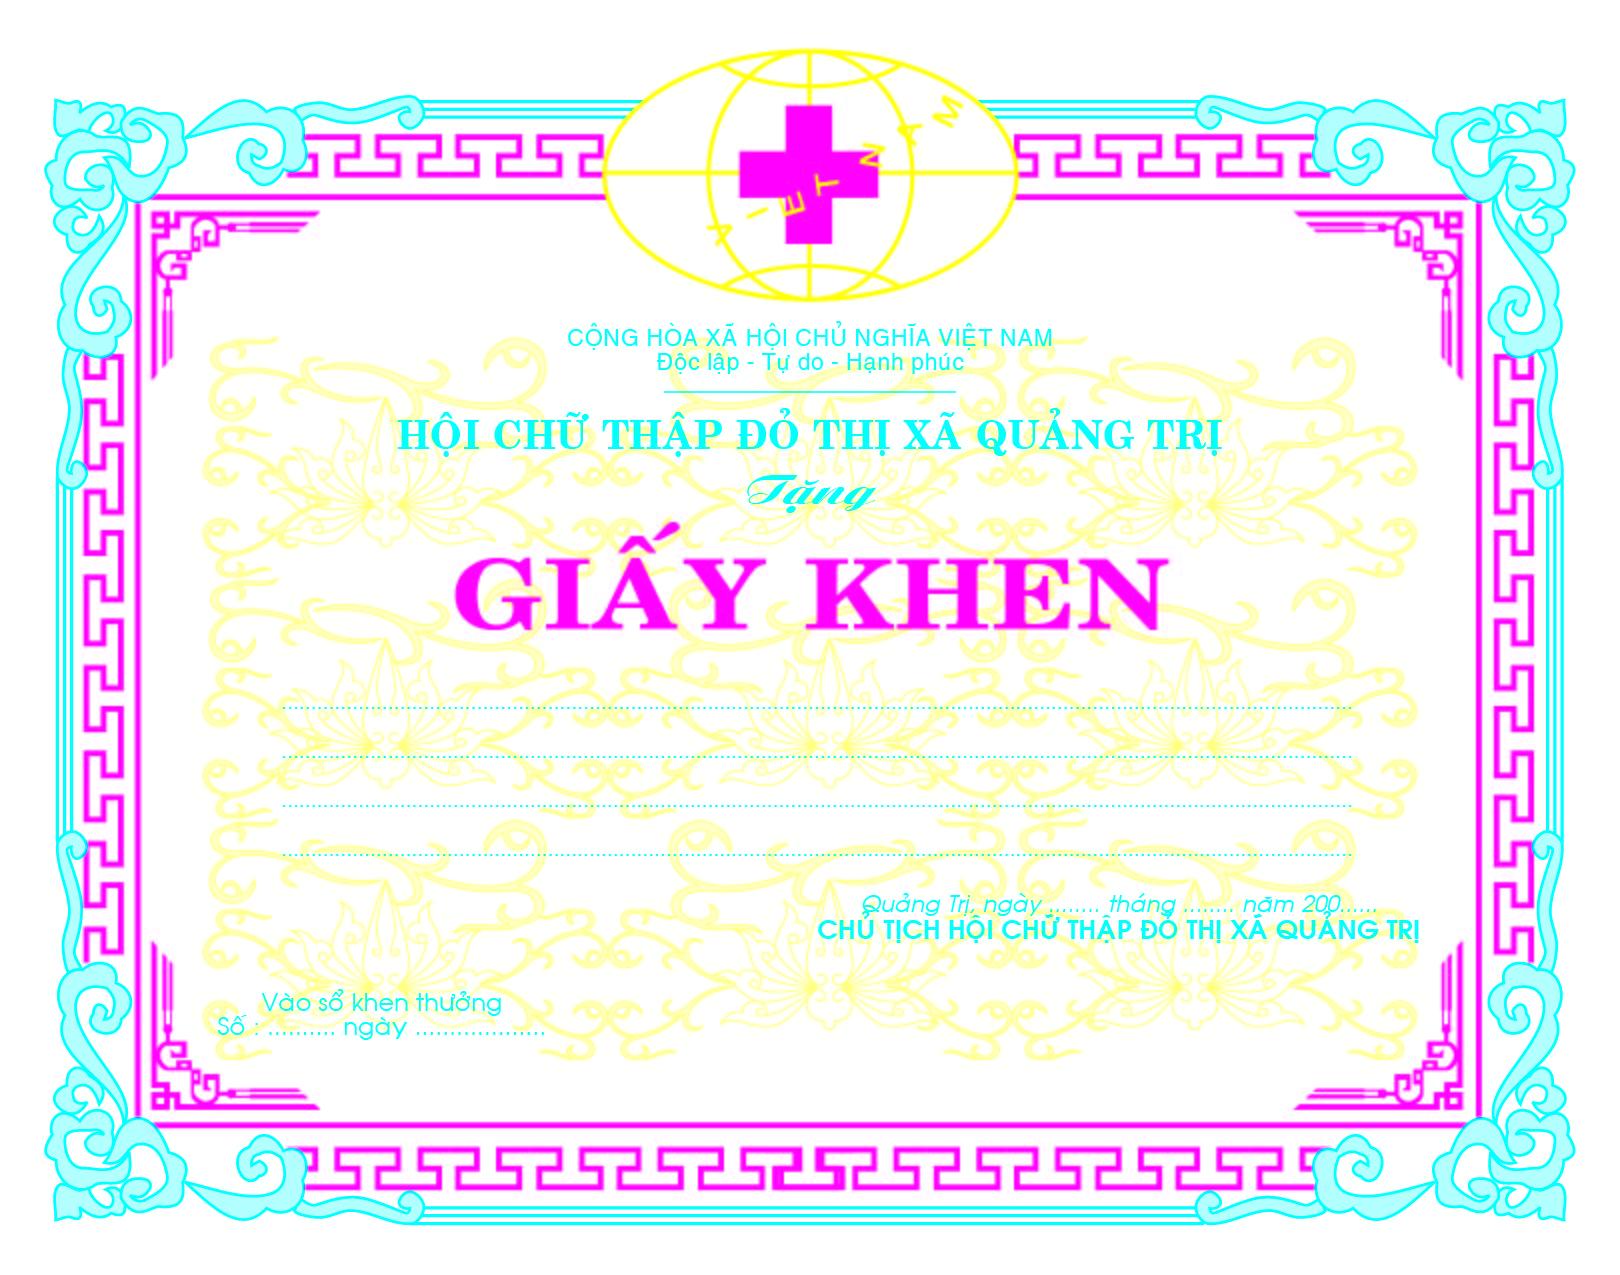 Mẫu giấy khen 013 - mẫu giấy khen Hội Chữ Thập Đỏ - Link Download : https://adsnew.net/5wvDwDCm